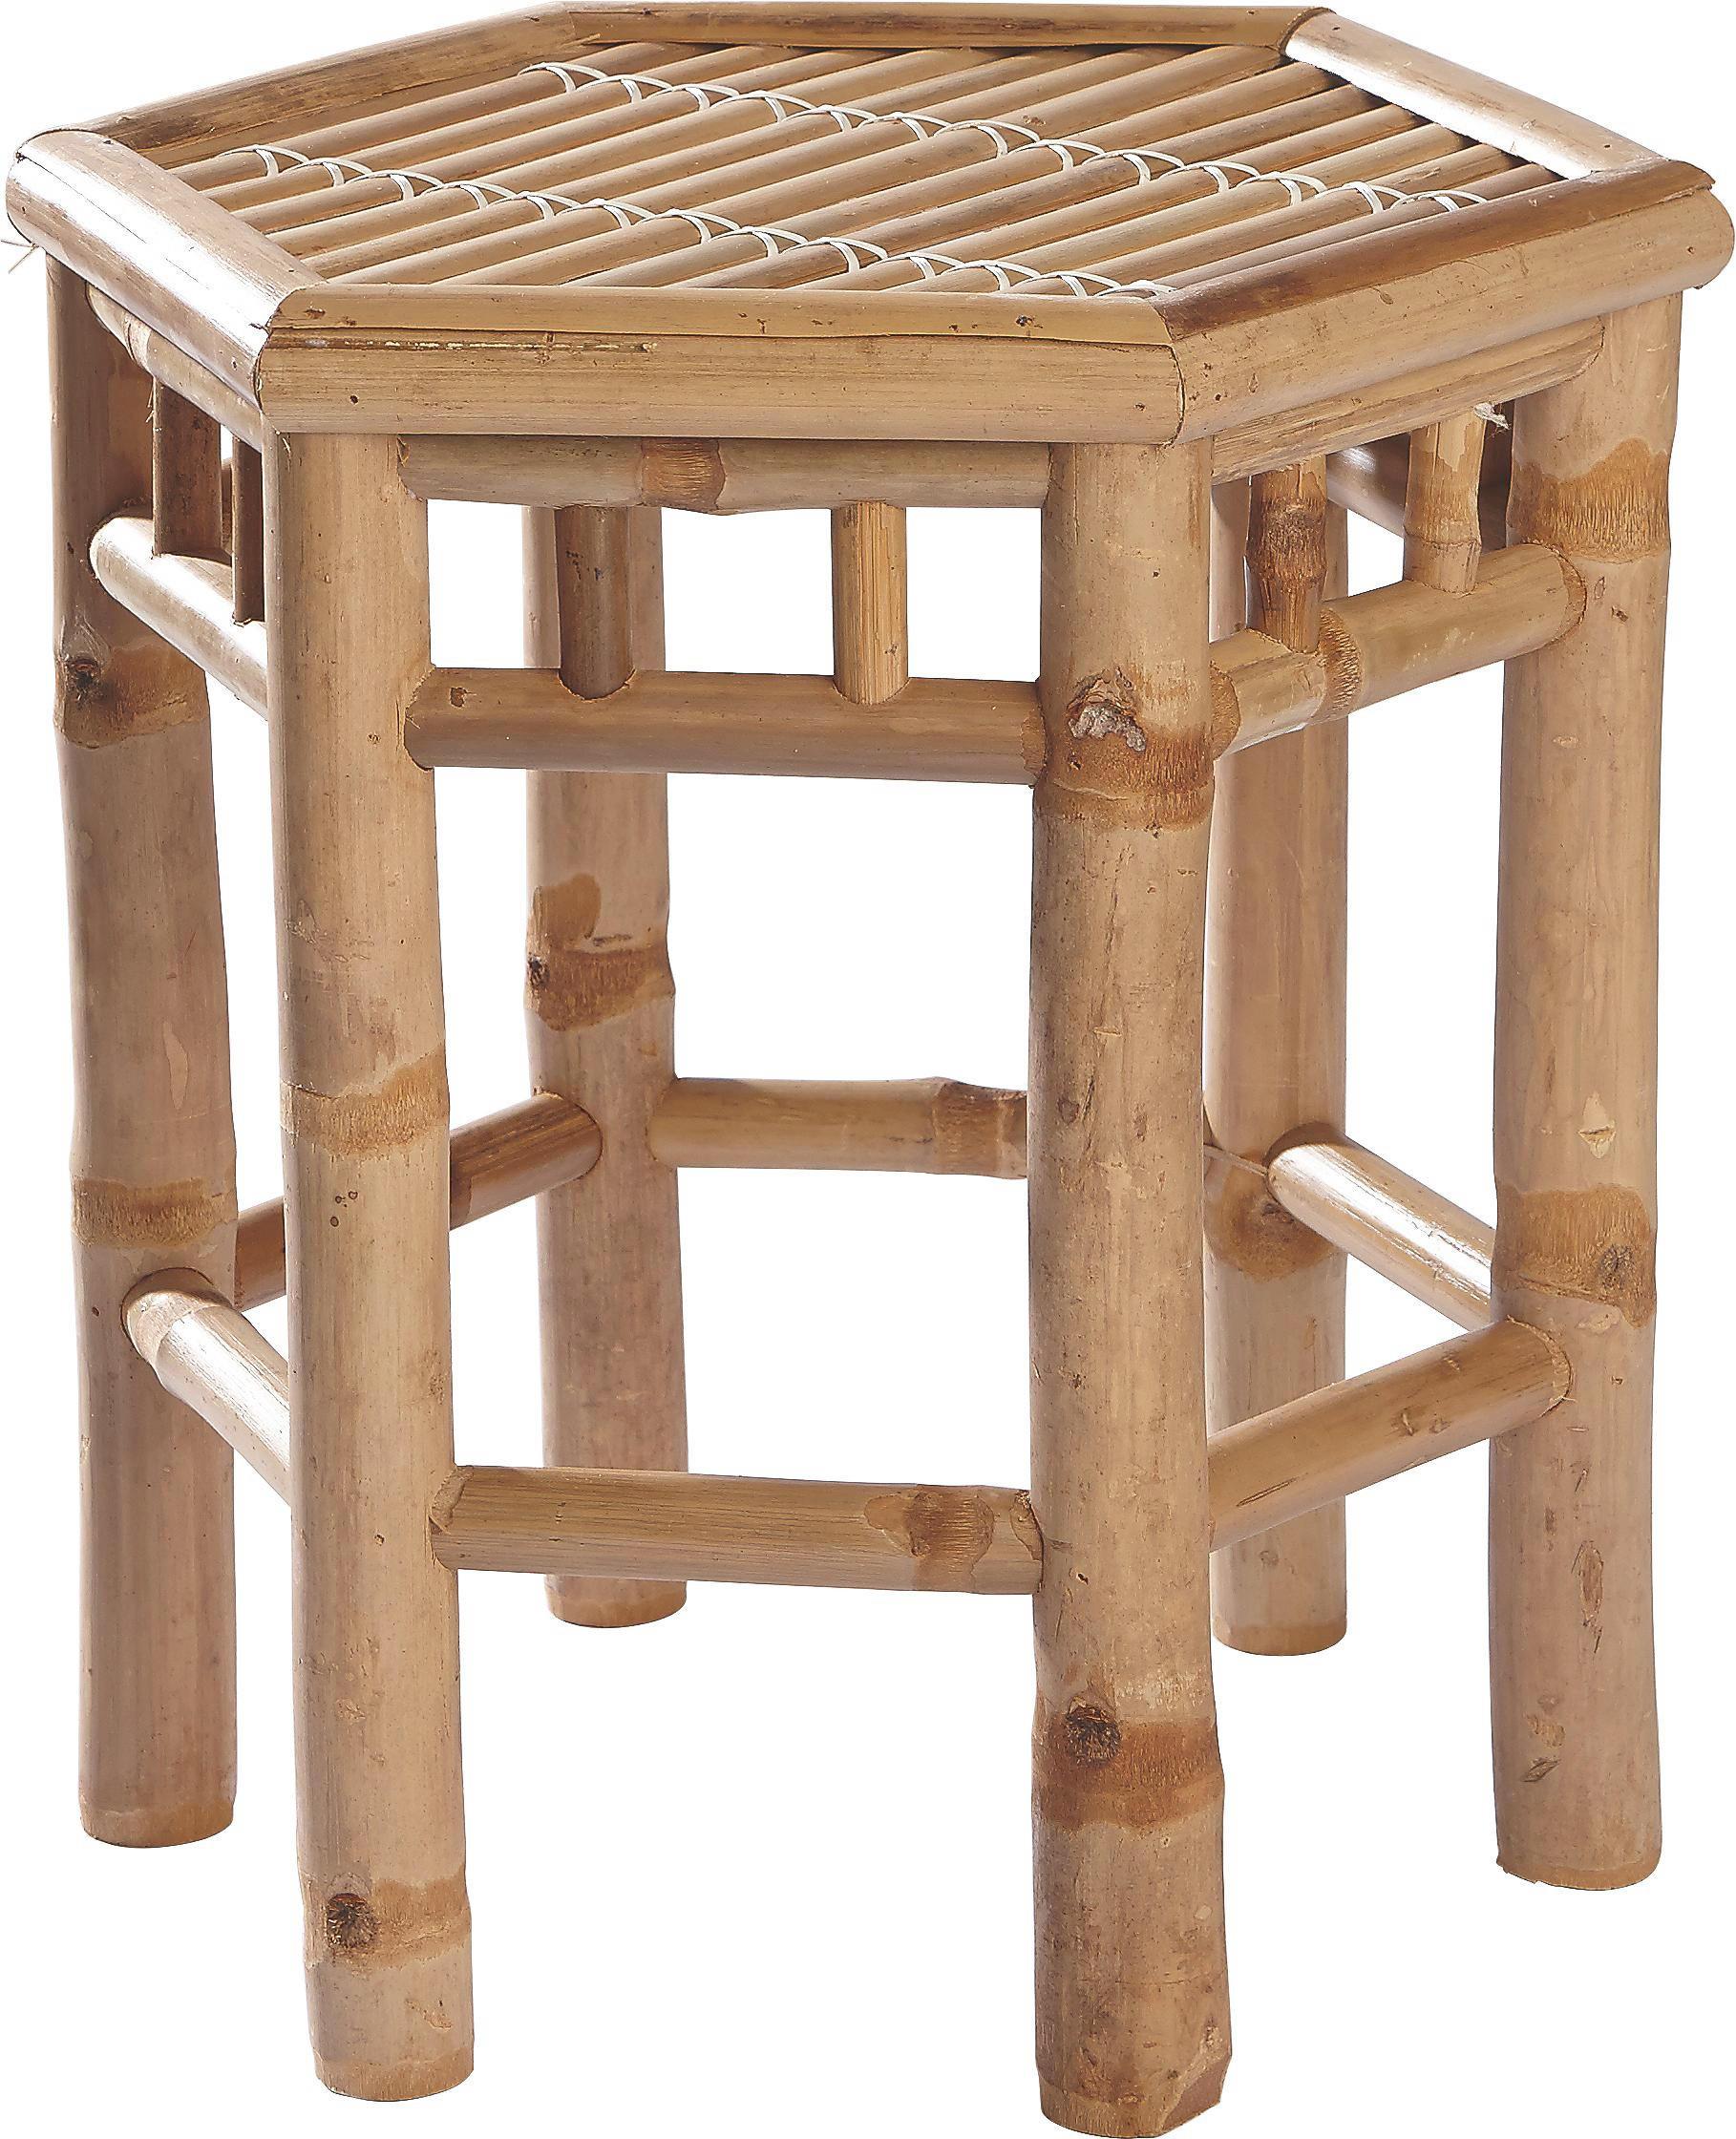 BLUMENTISCH - Naturfarben, Basics, Holz/Kunststoff (38/37cm) - LANDSCAPE